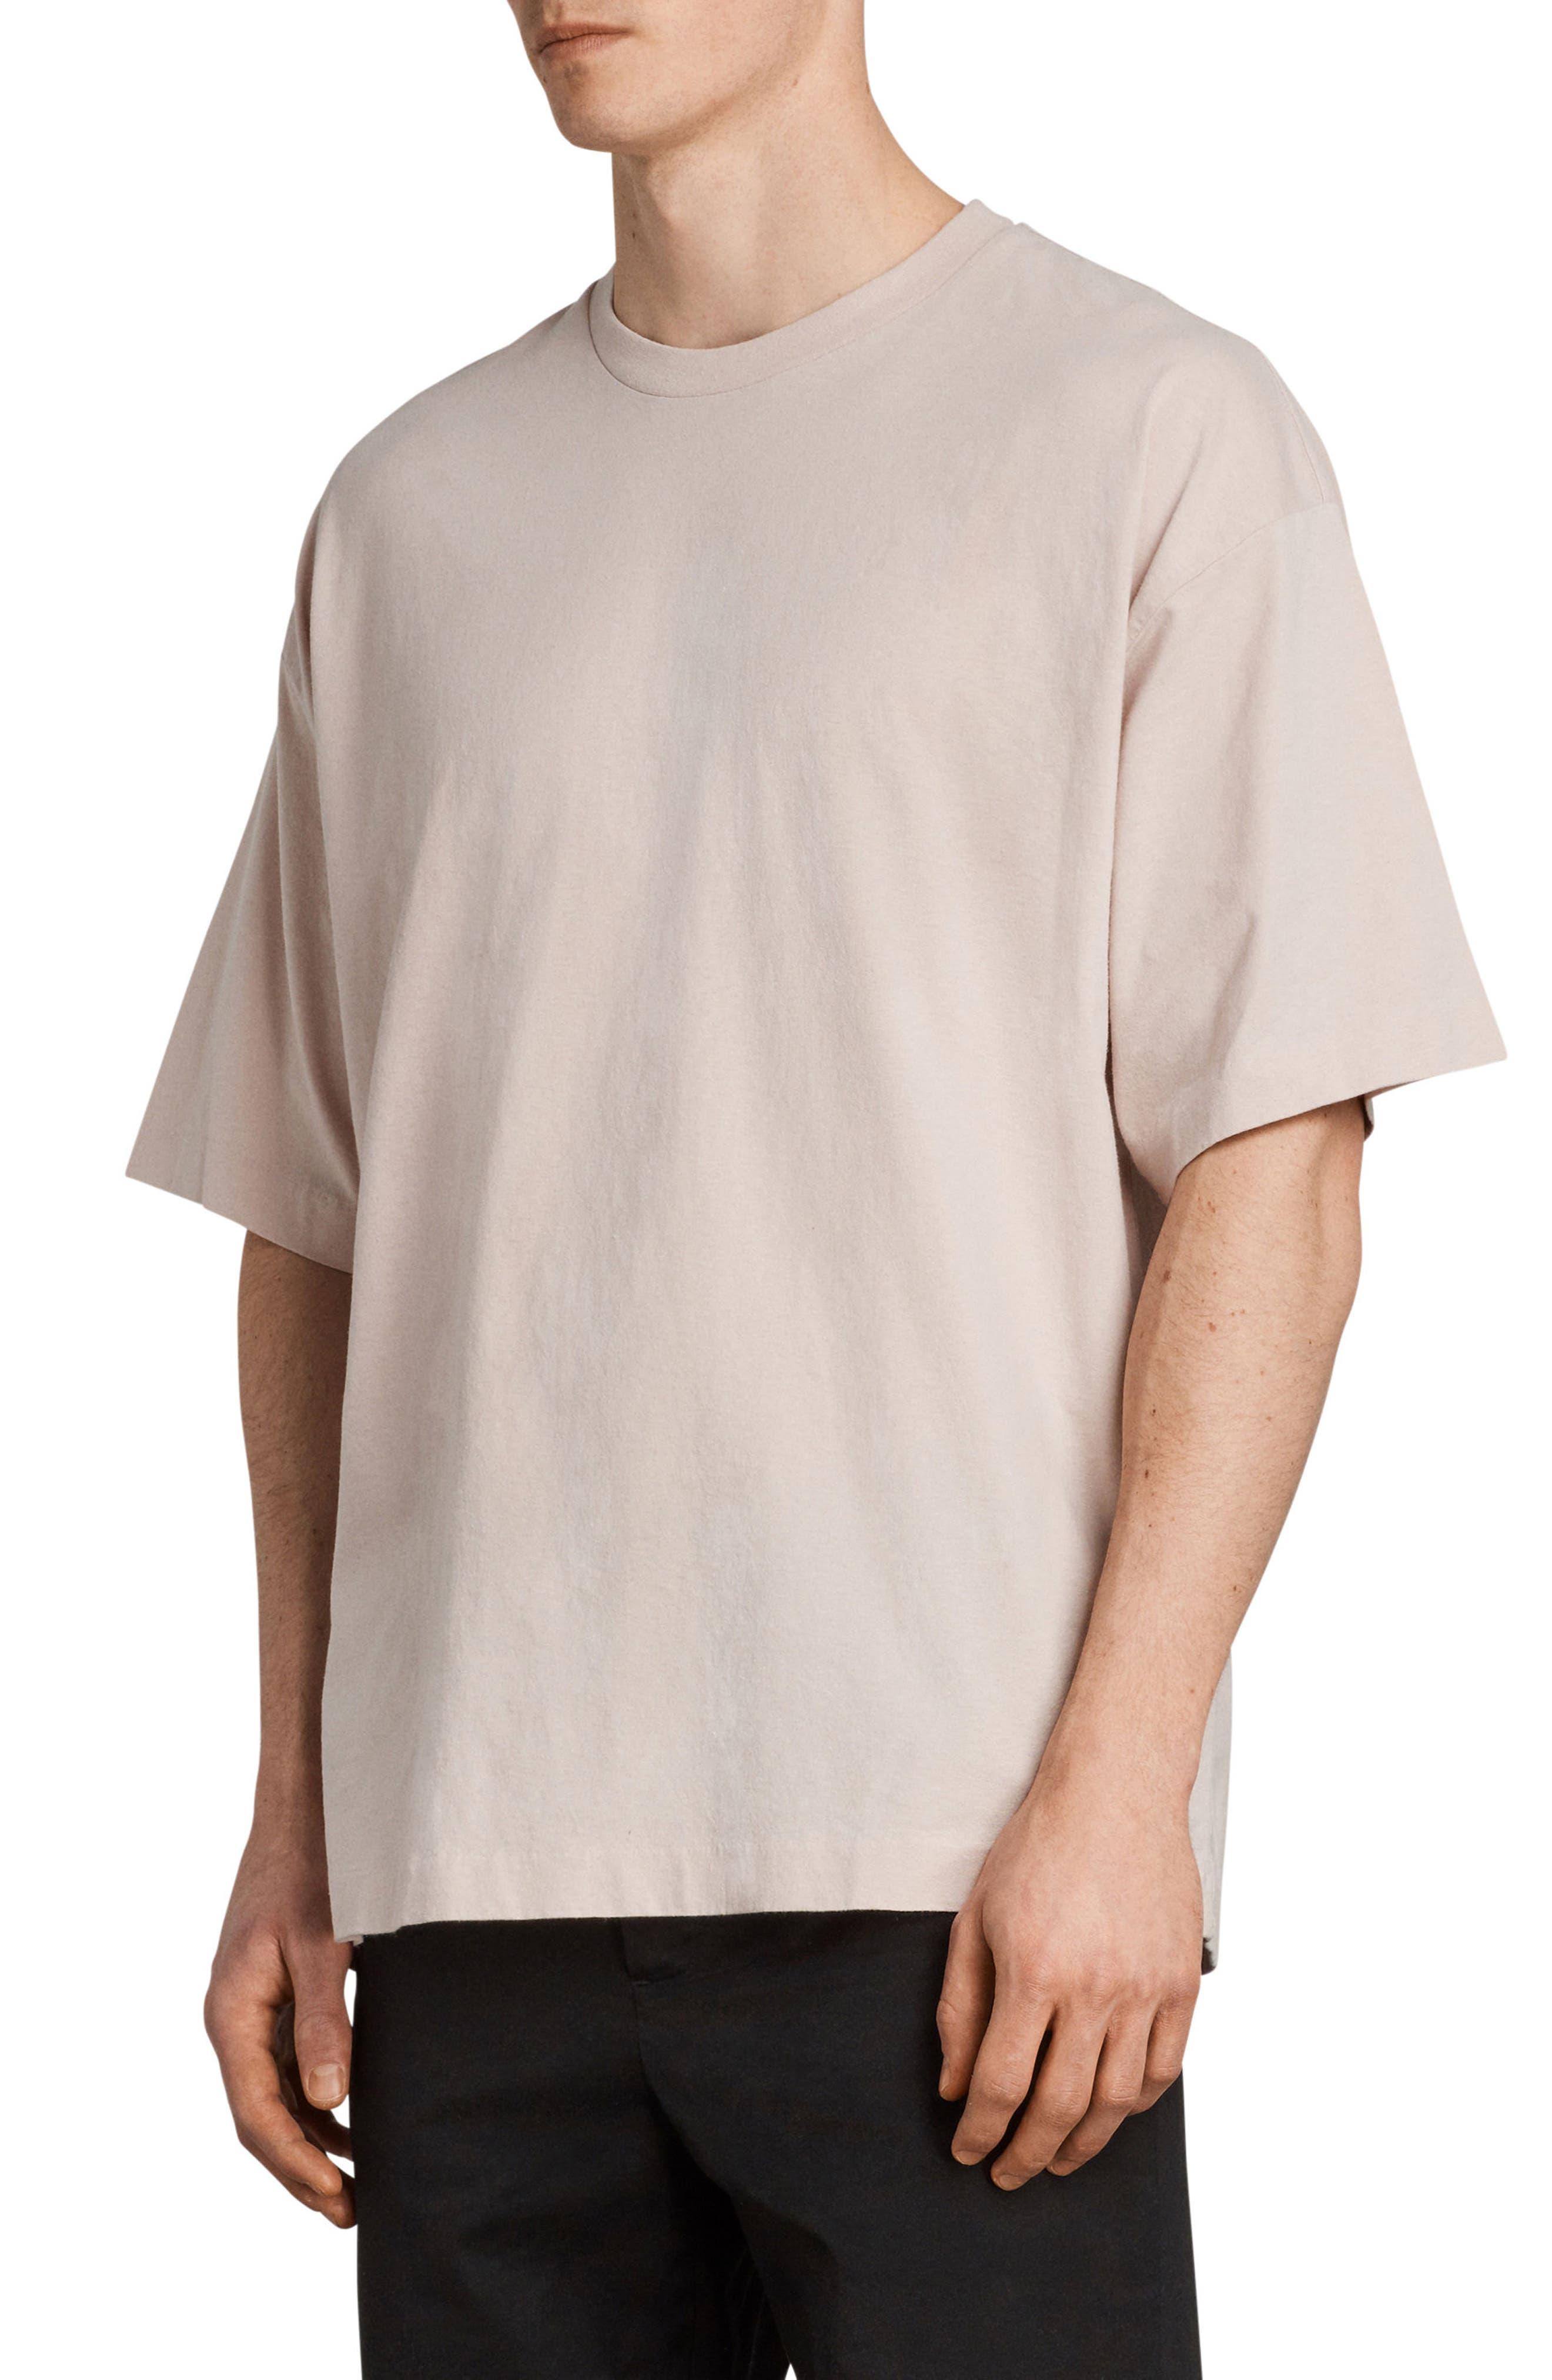 Atnom Crewneck T-Shirt,                             Alternate thumbnail 3, color,                             River Pink